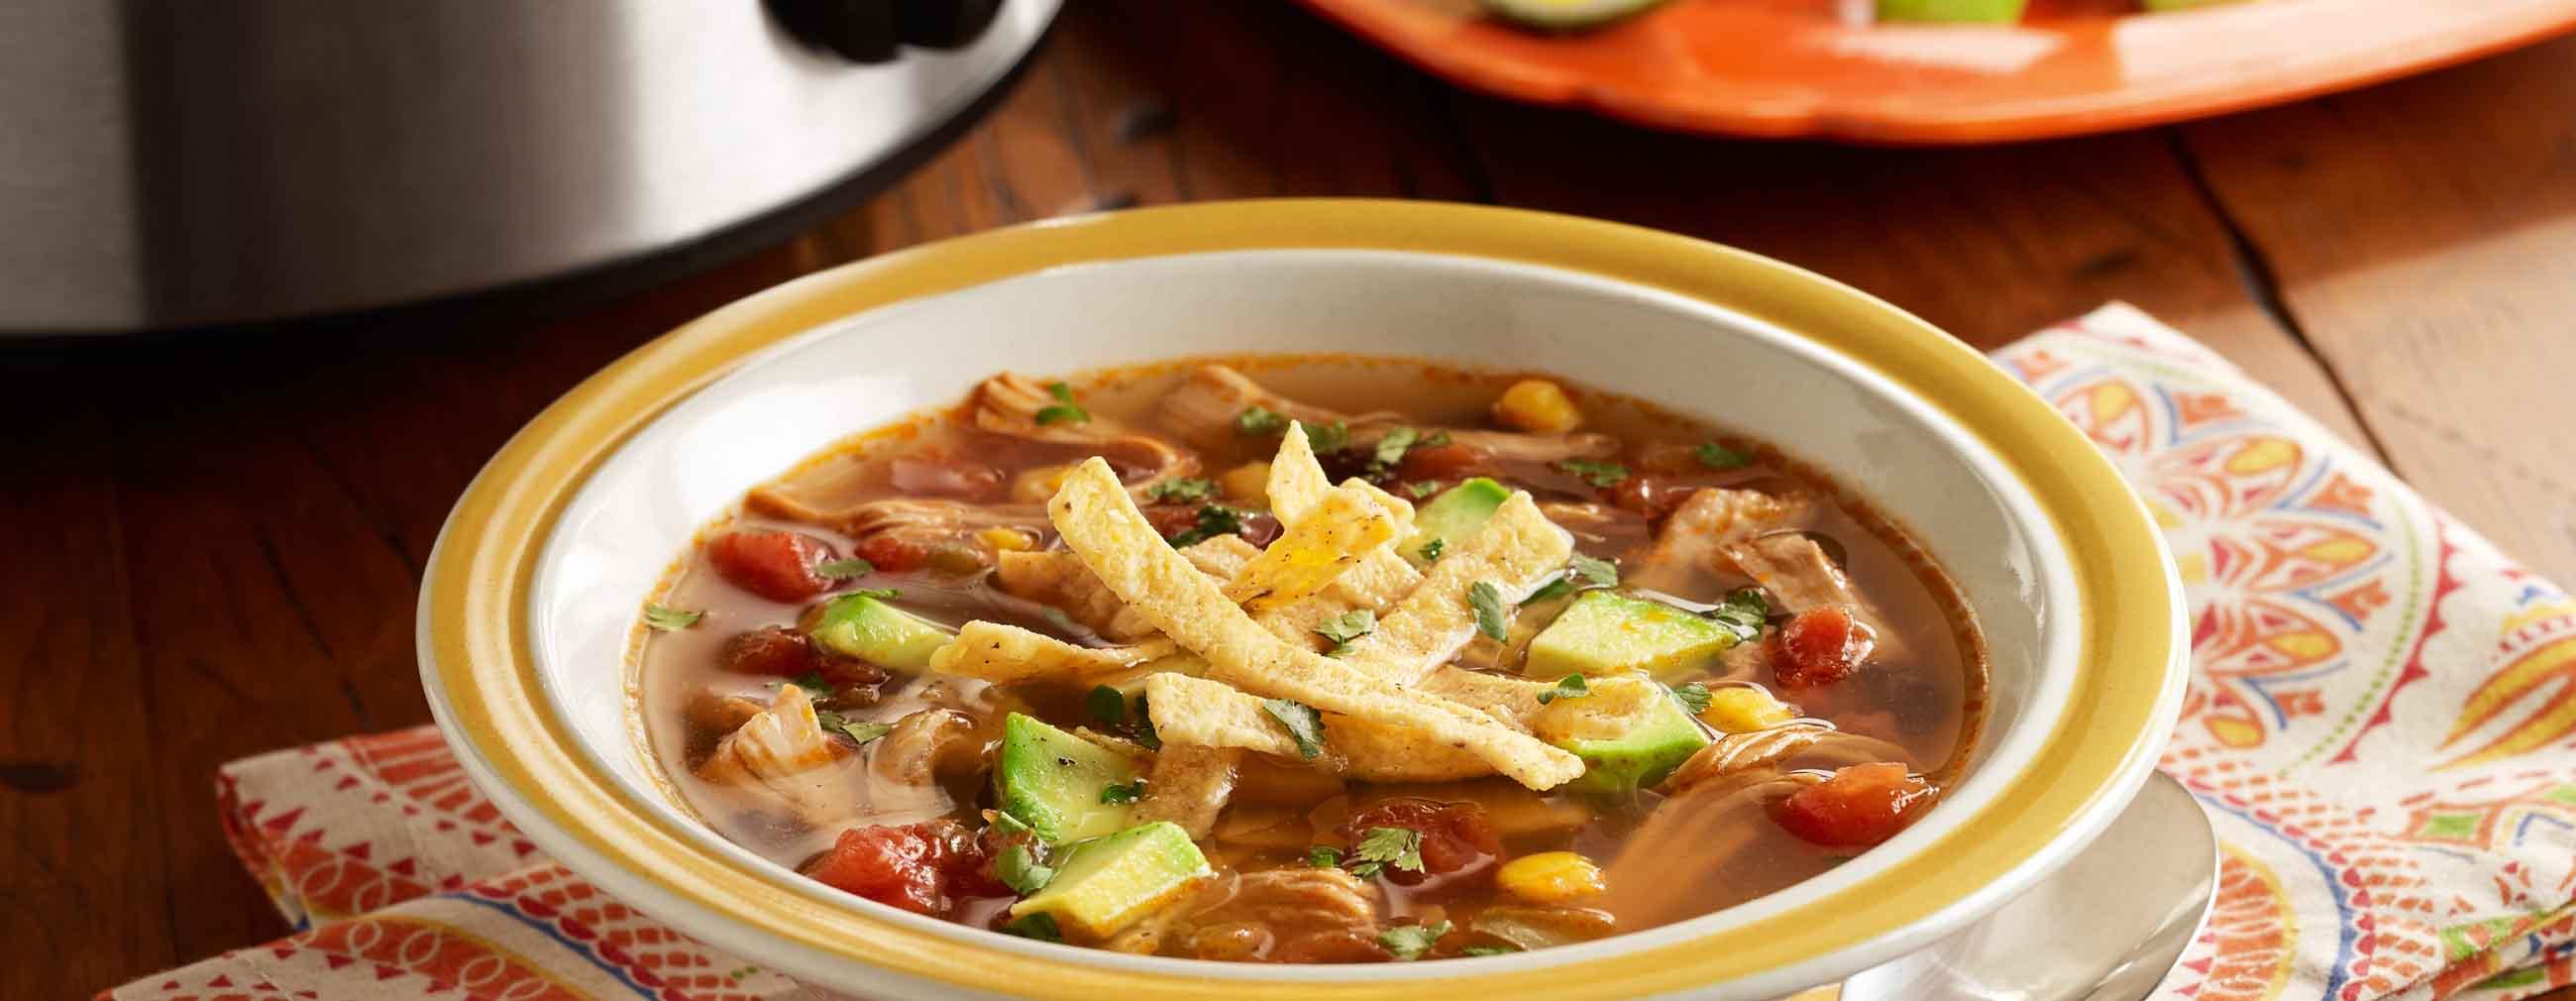 Slow Cooker Chicken Tortilla Soup Ready Set Eat